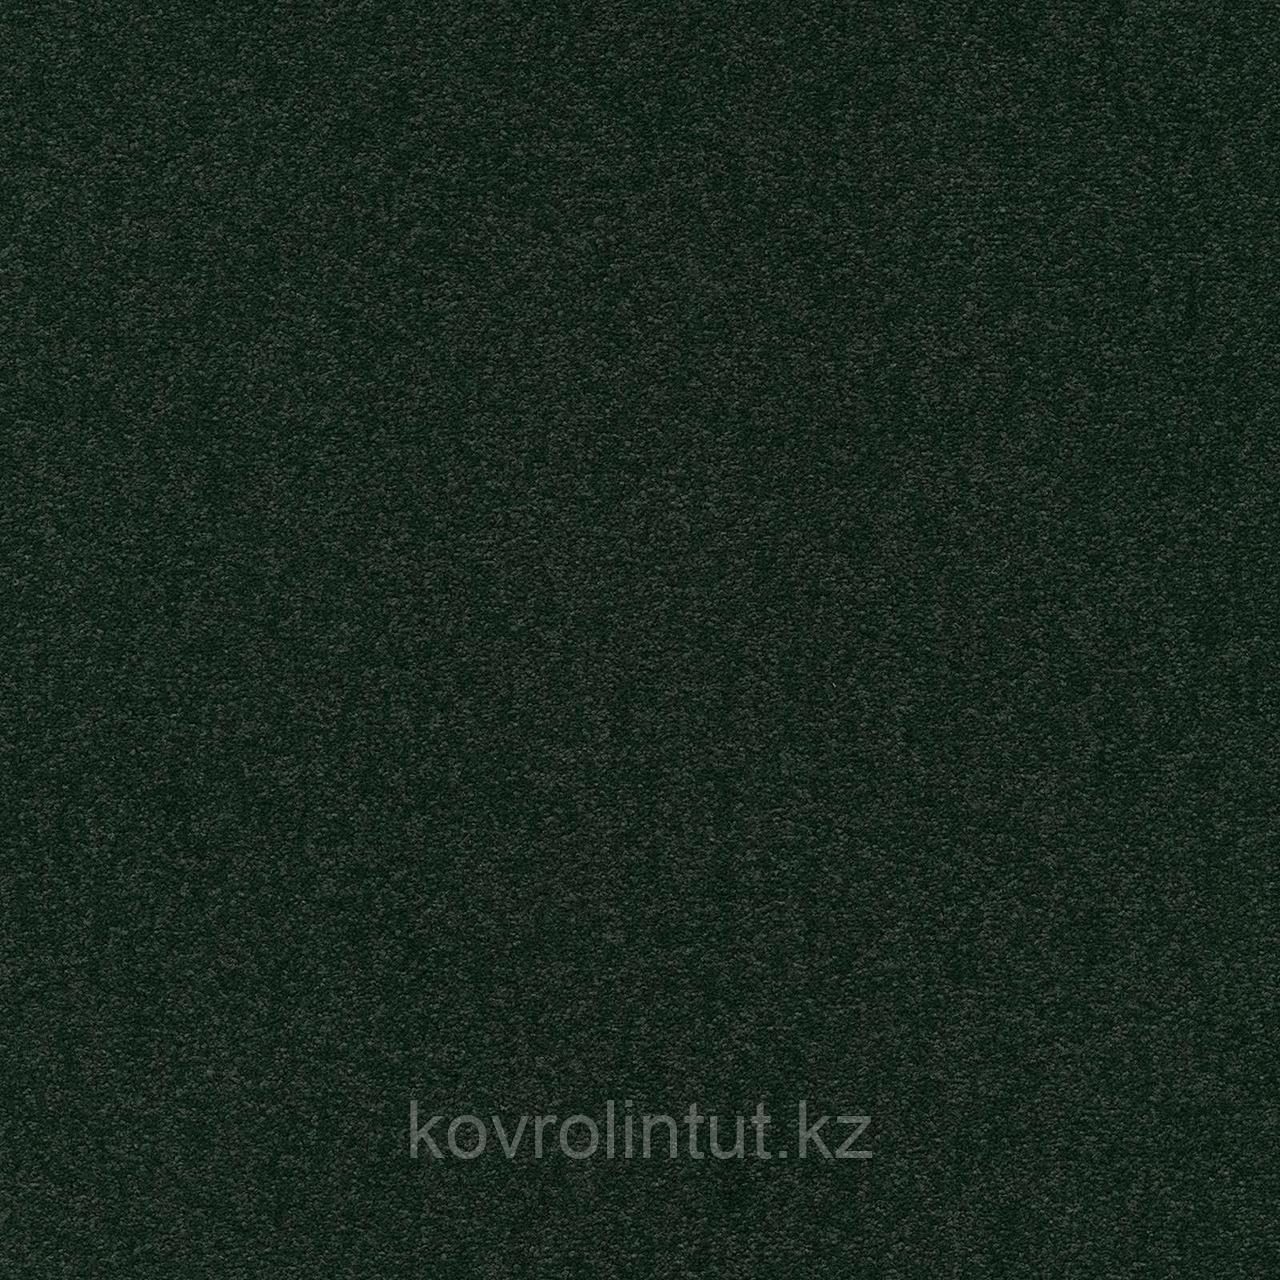 Плитка ковровая Modulyss Cambridge 616, 100% PA